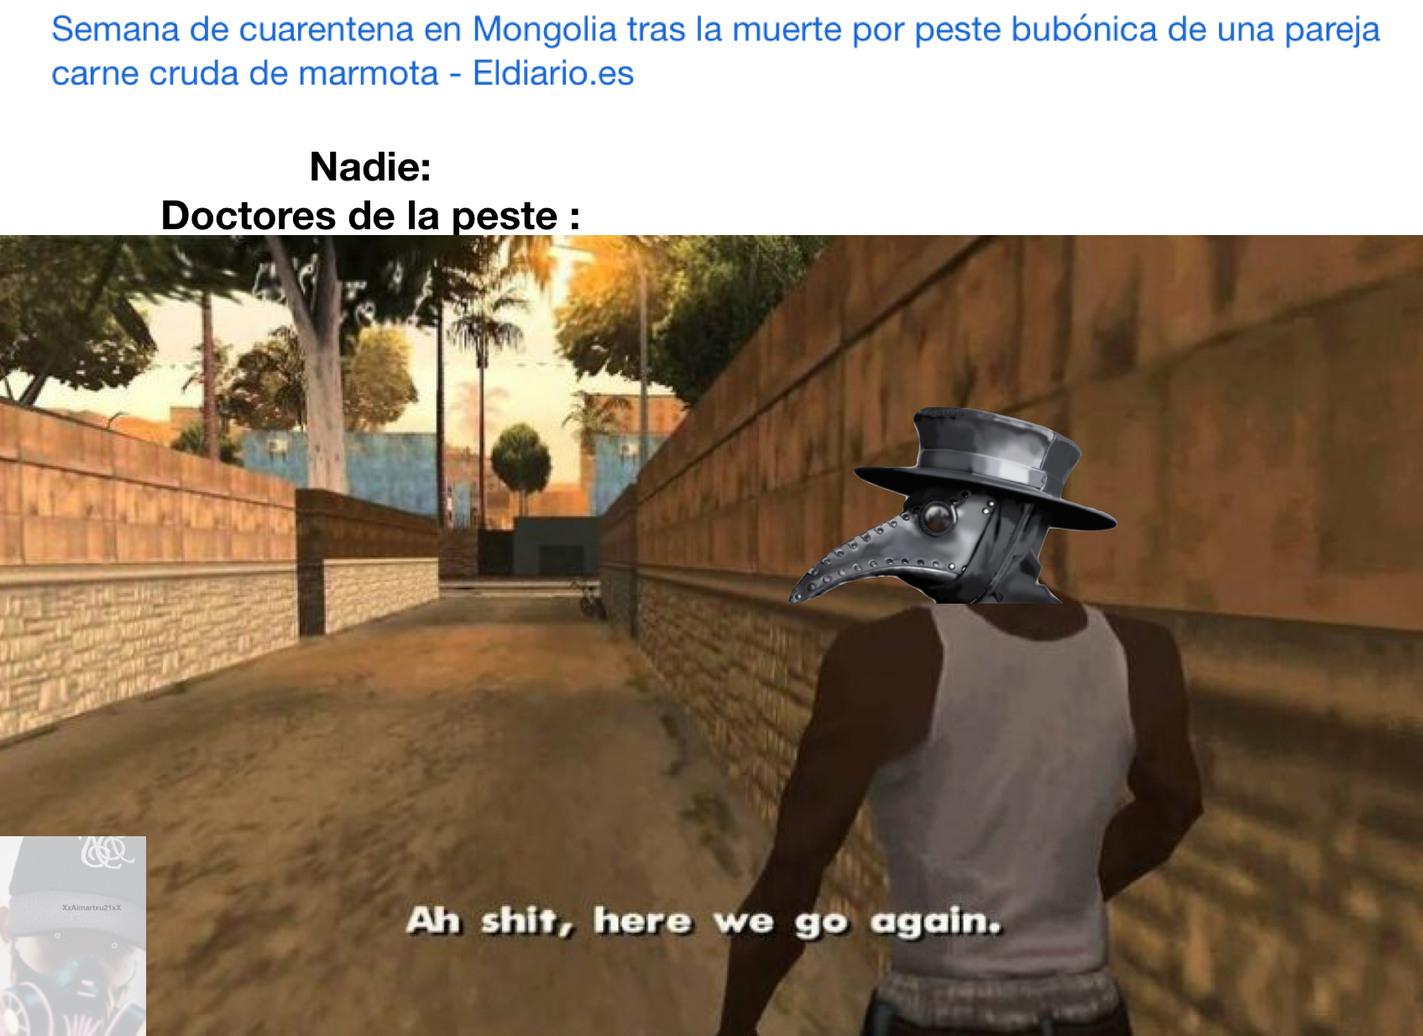 Ah shit here we go again - meme